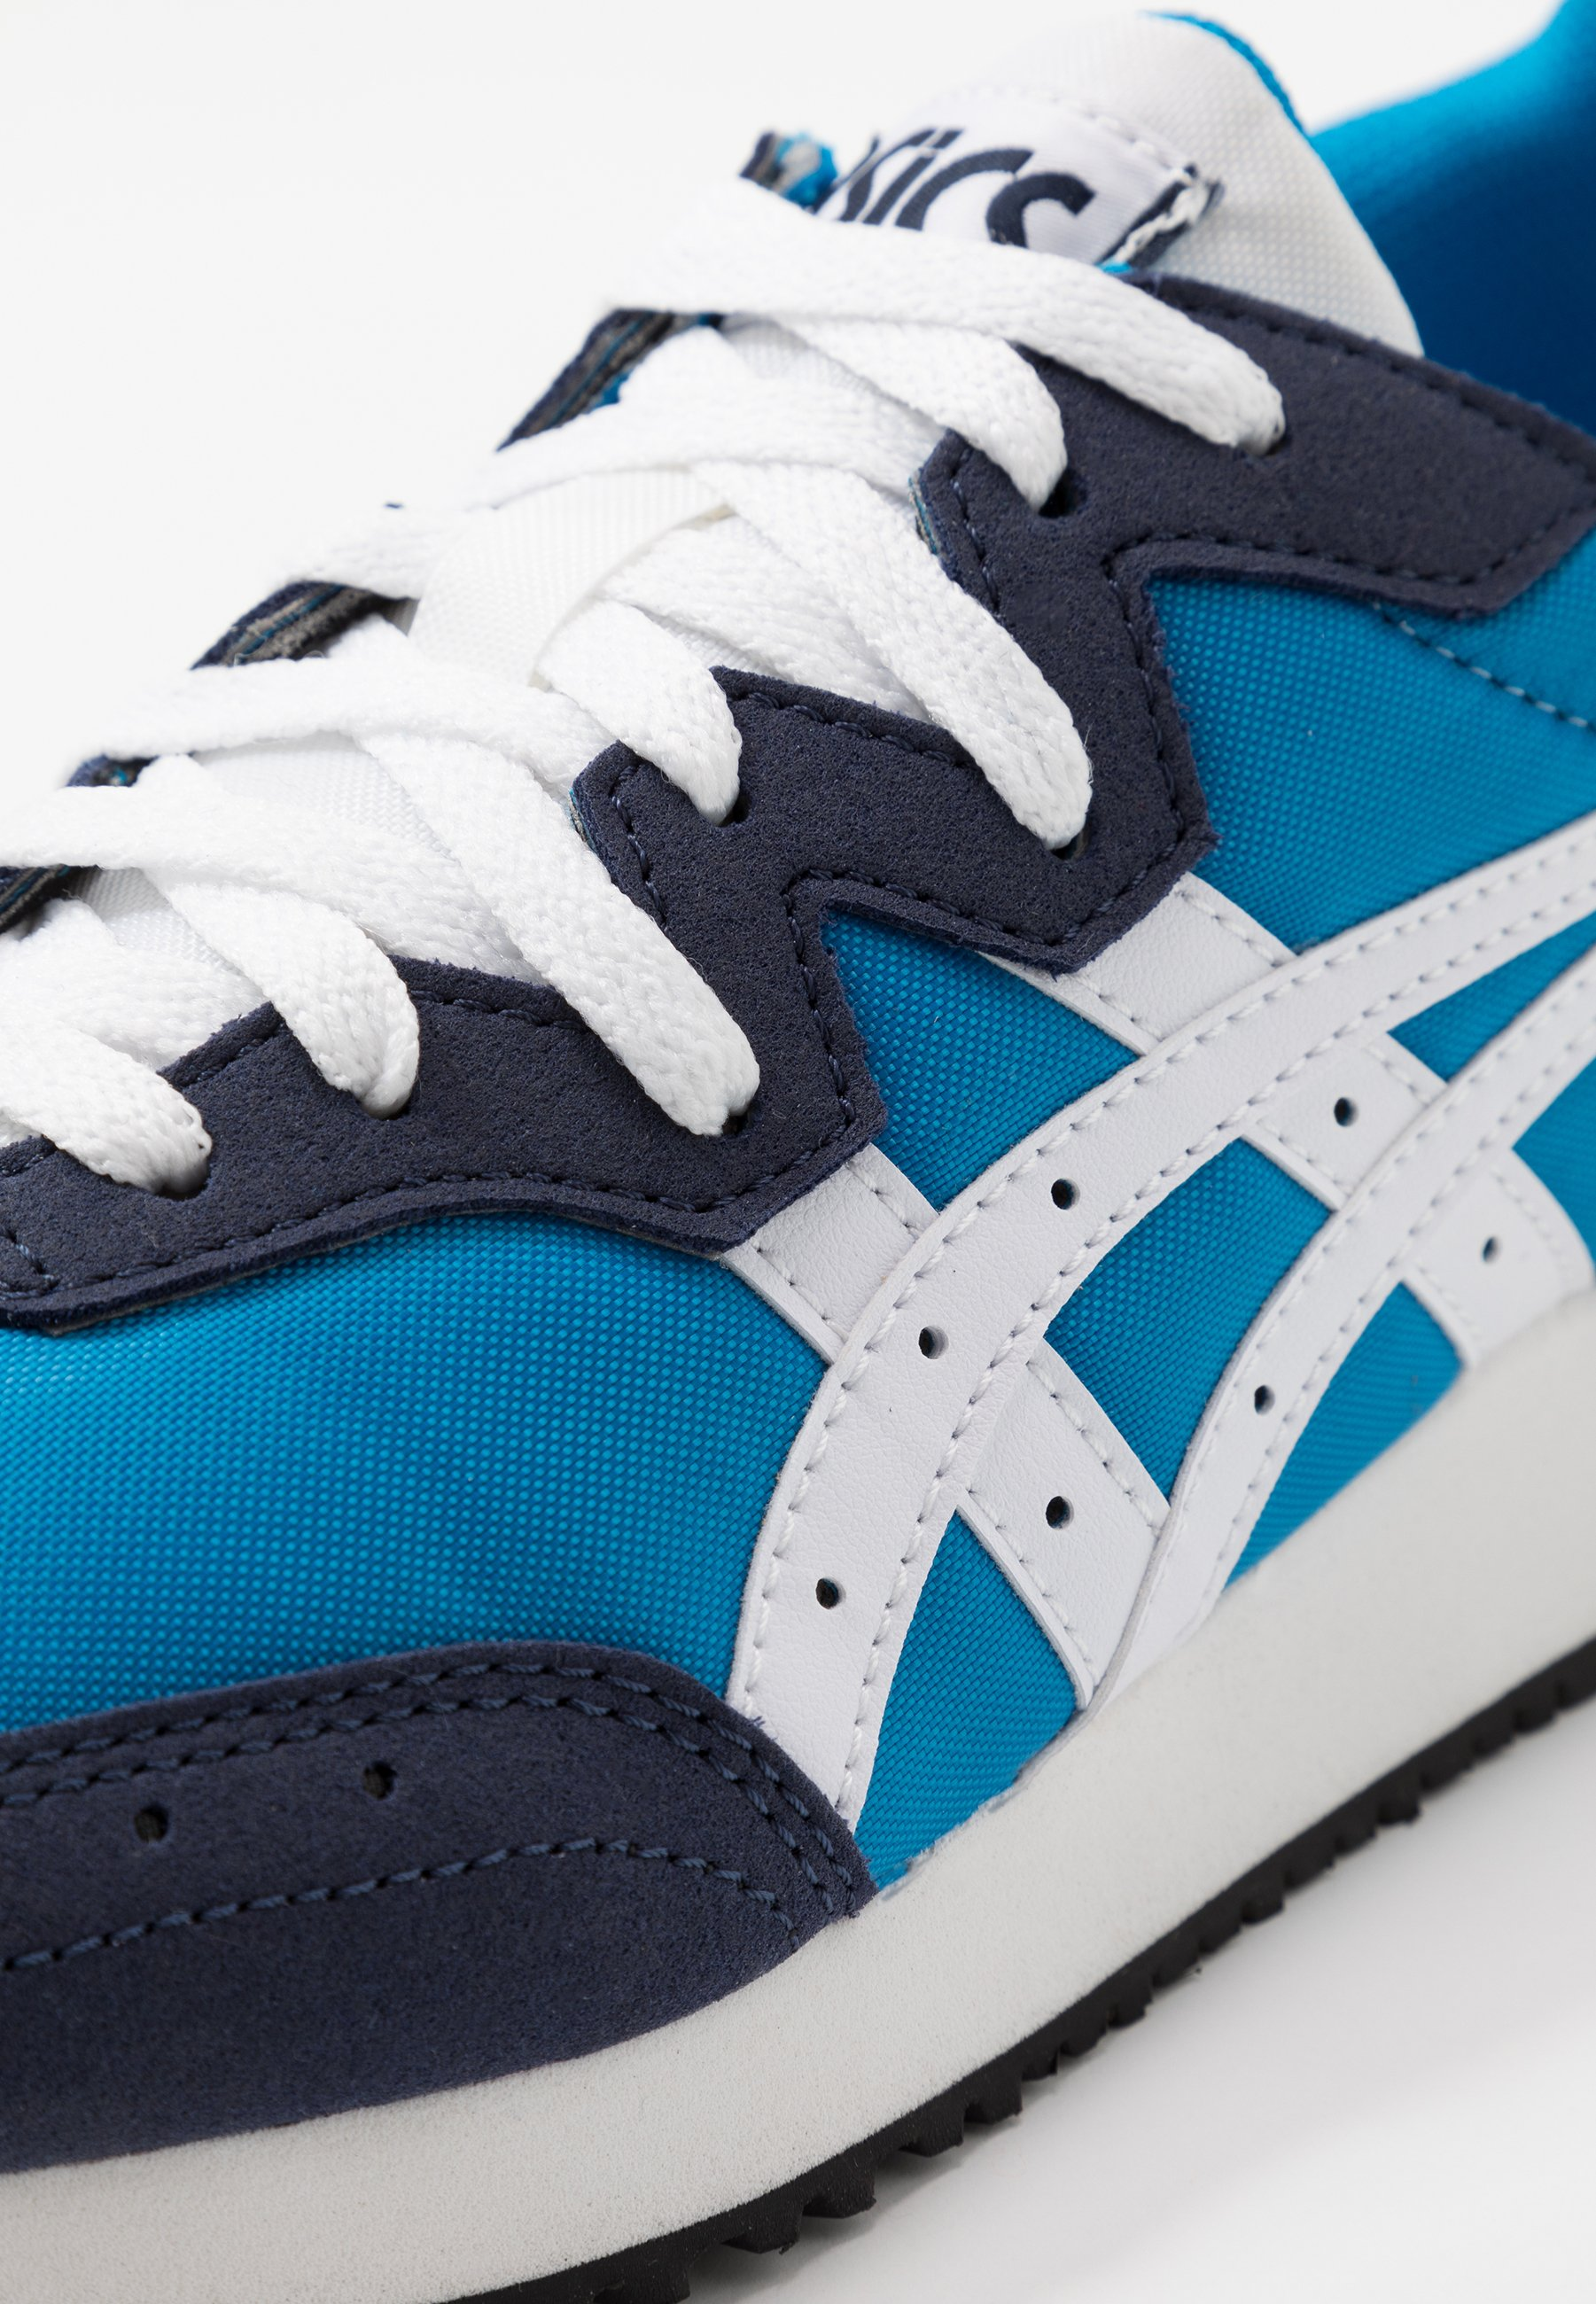 Asics Sportstyle Tarther - Sneakers Laag Directoire Blue/white Goedkope Schoenen